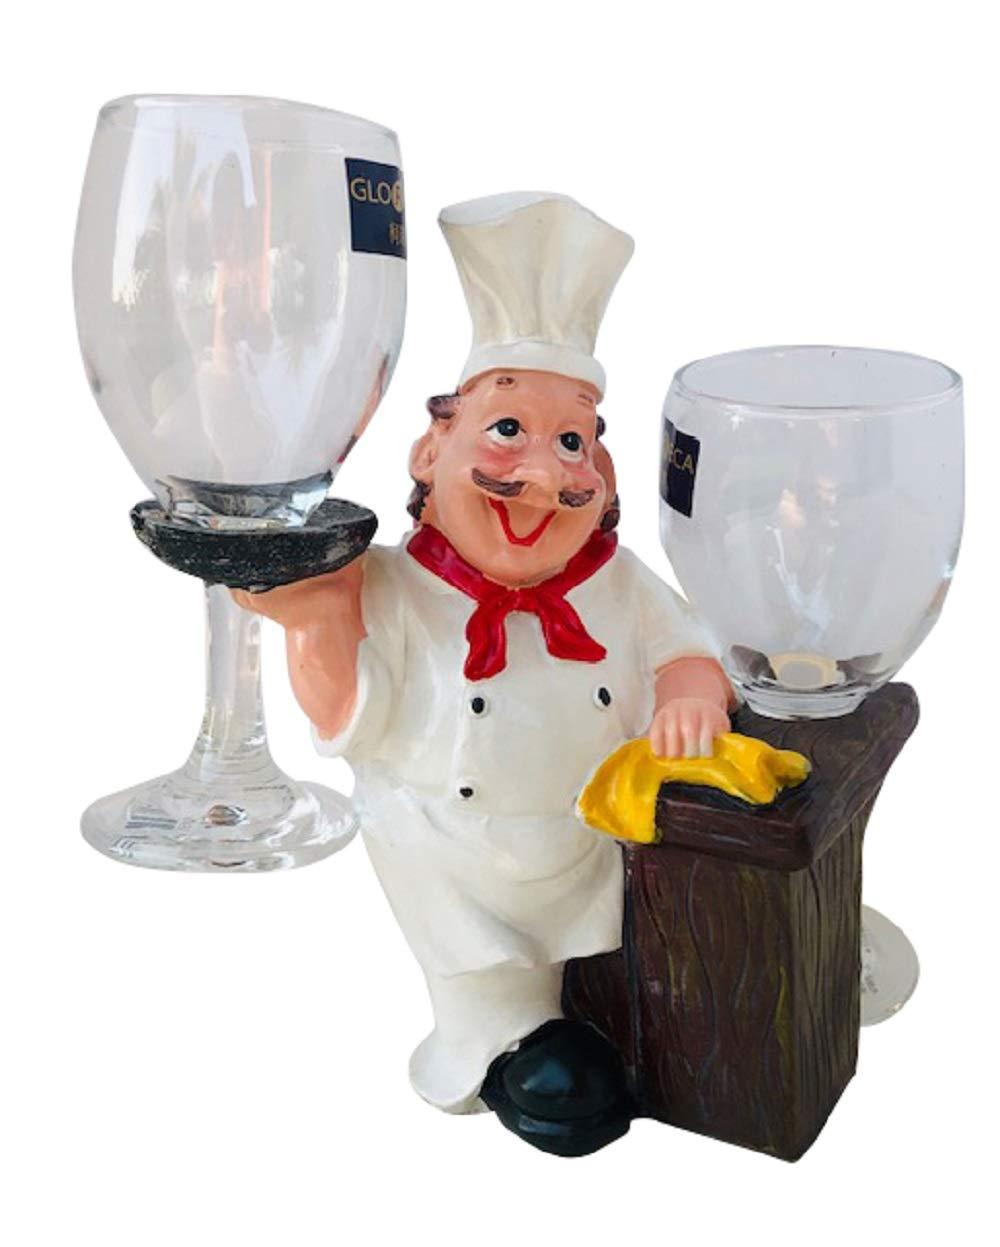 Smiling Chef Figurine Kitchen Decor Wine Glass Holder Decoration